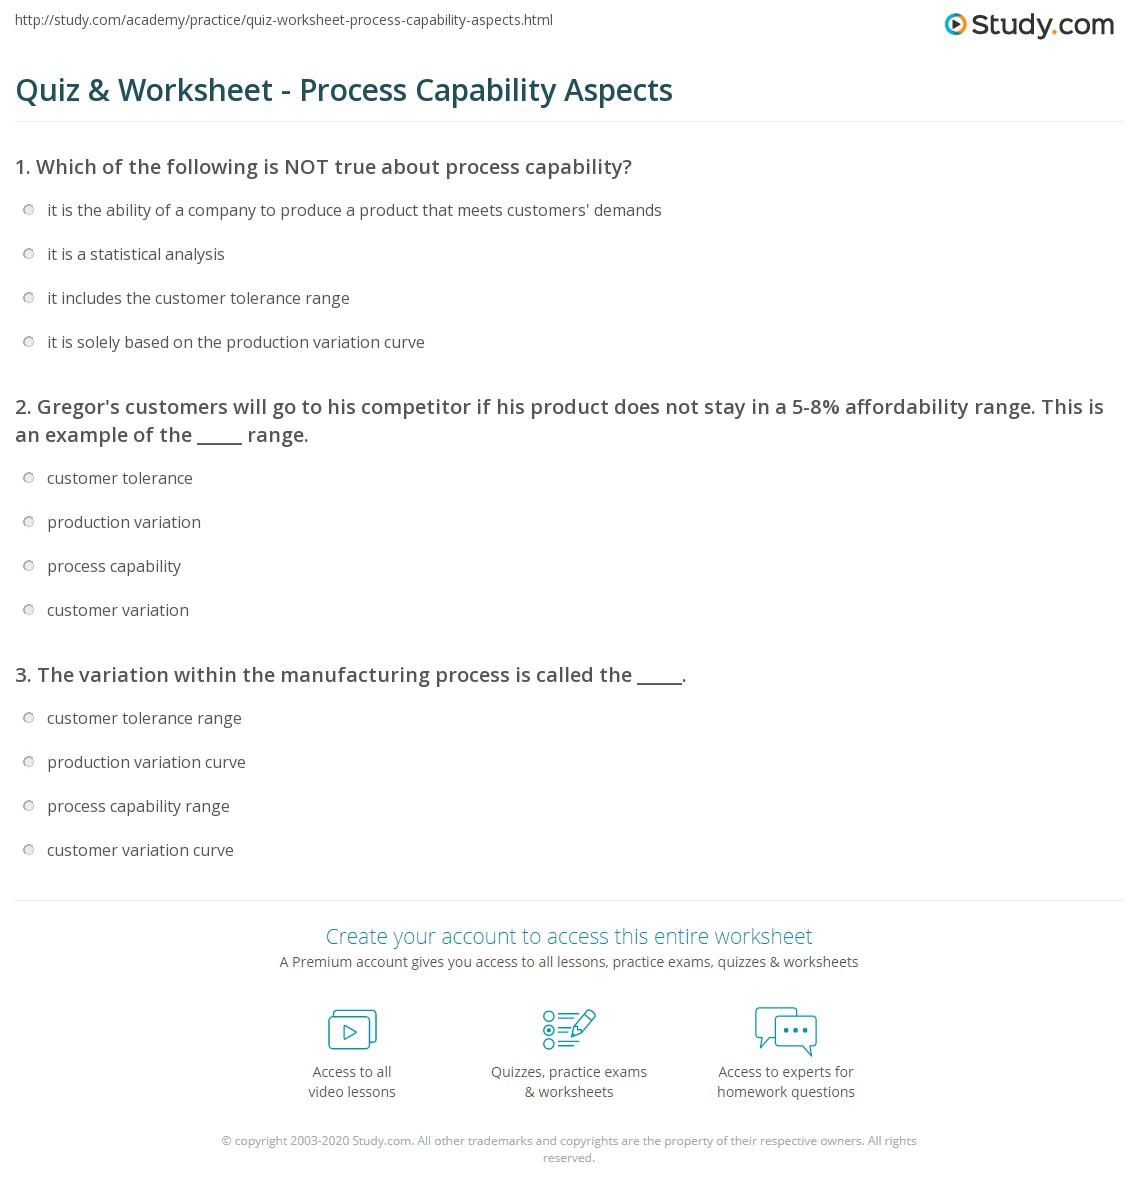 Quiz & Worksheet - Process Capability Aspects | Study.com